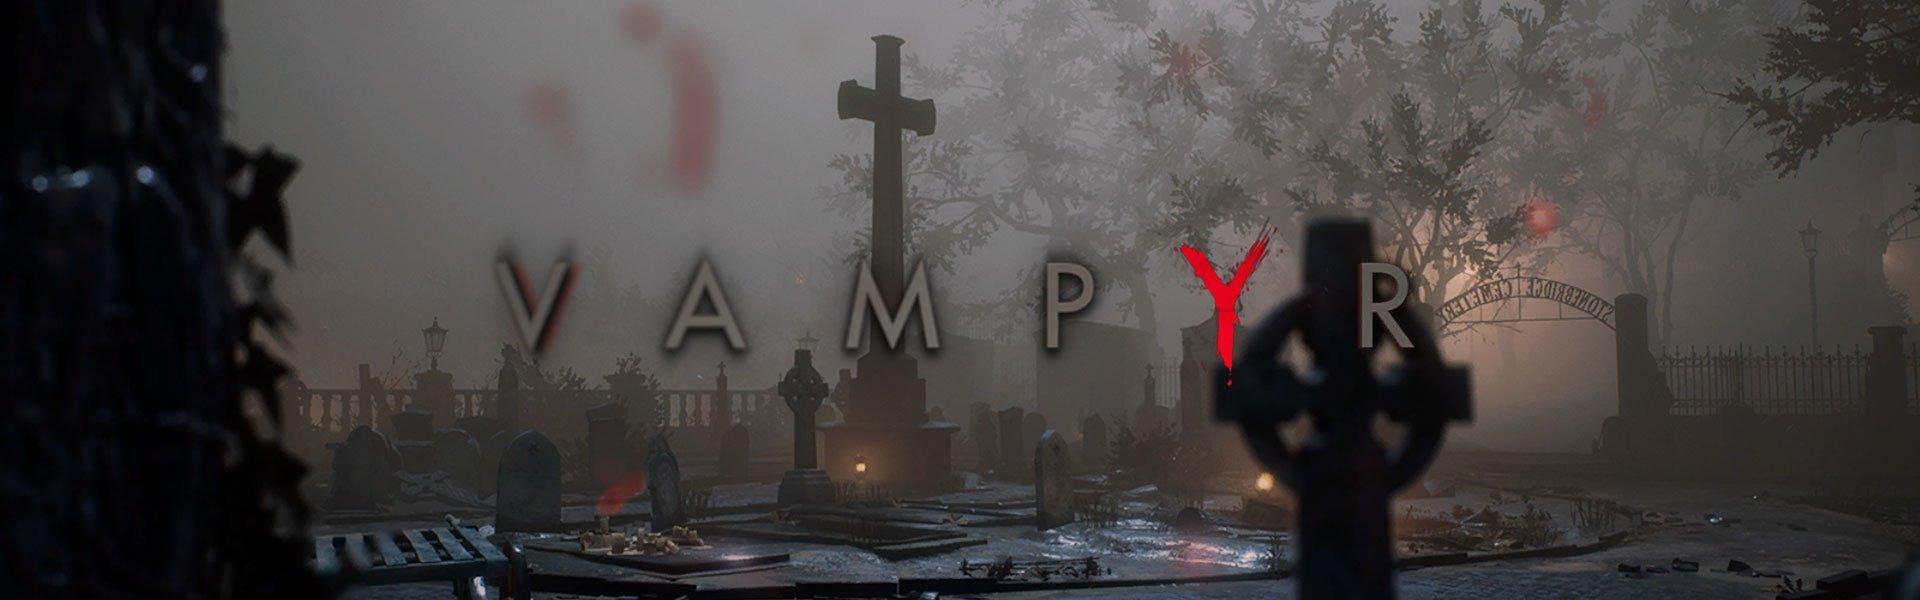 Vampyr: Test